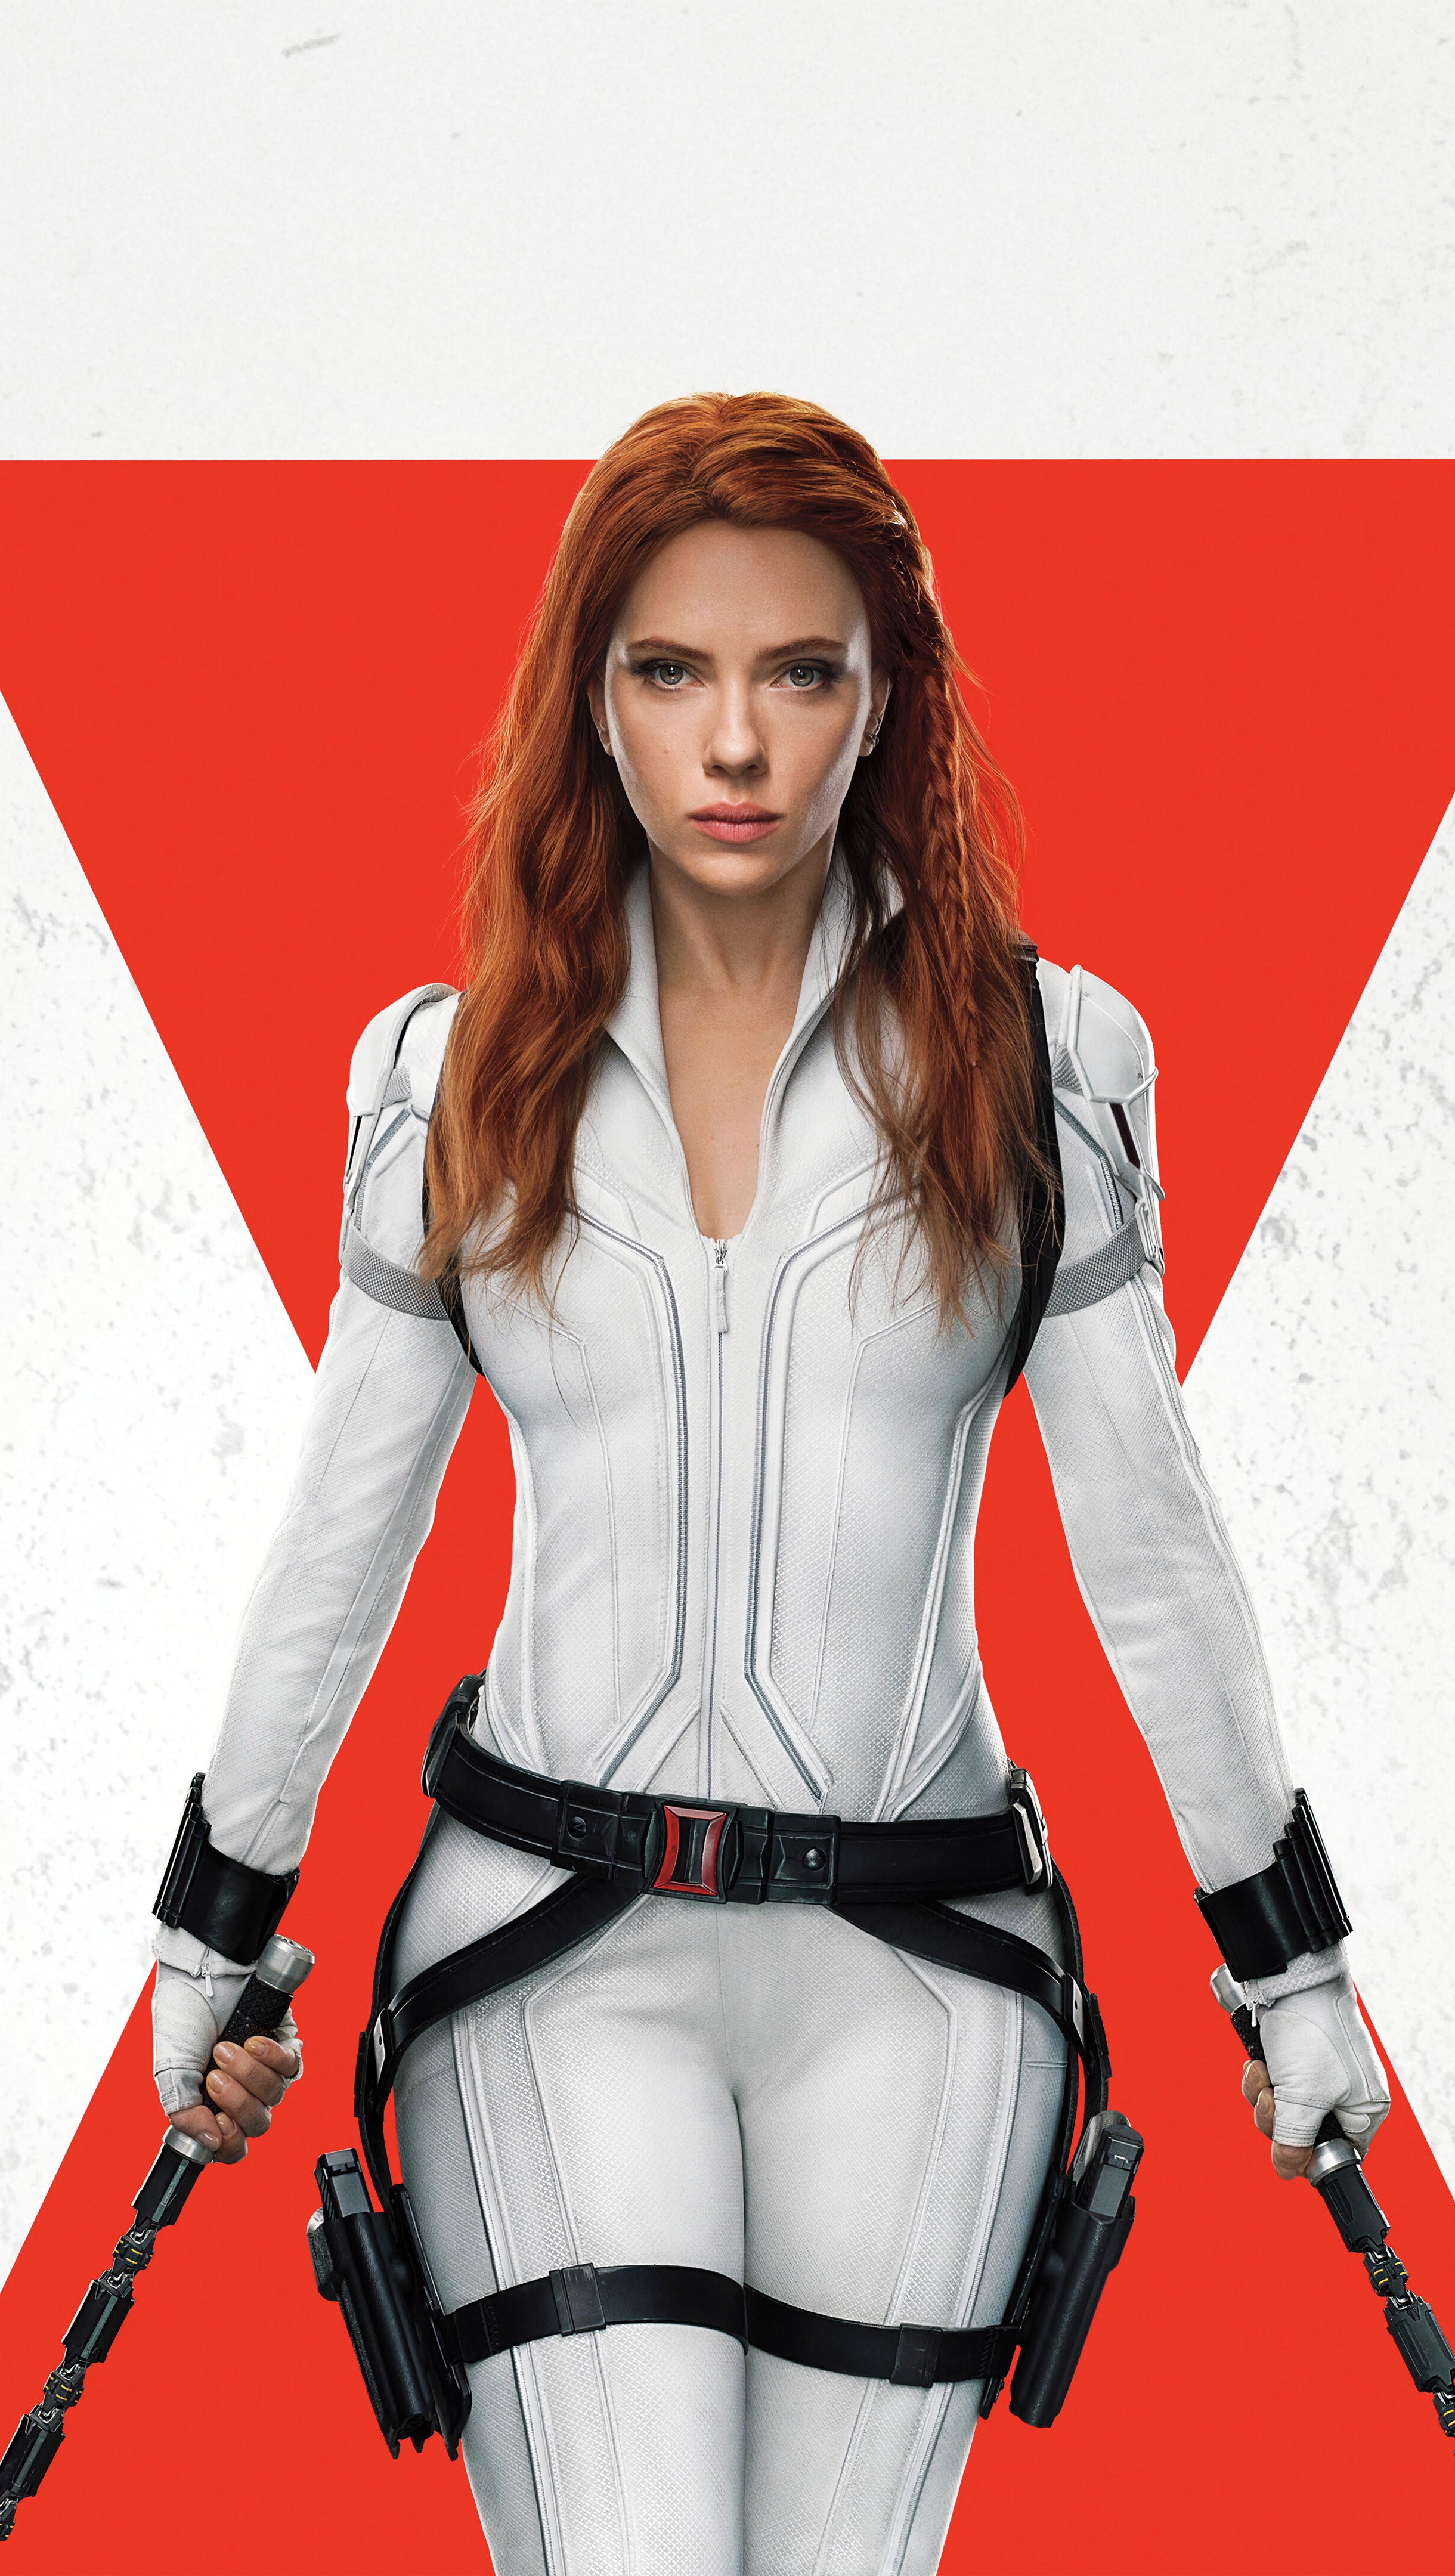 Wallpaper Scarlett Johansson as Black Widow Movie Vertical